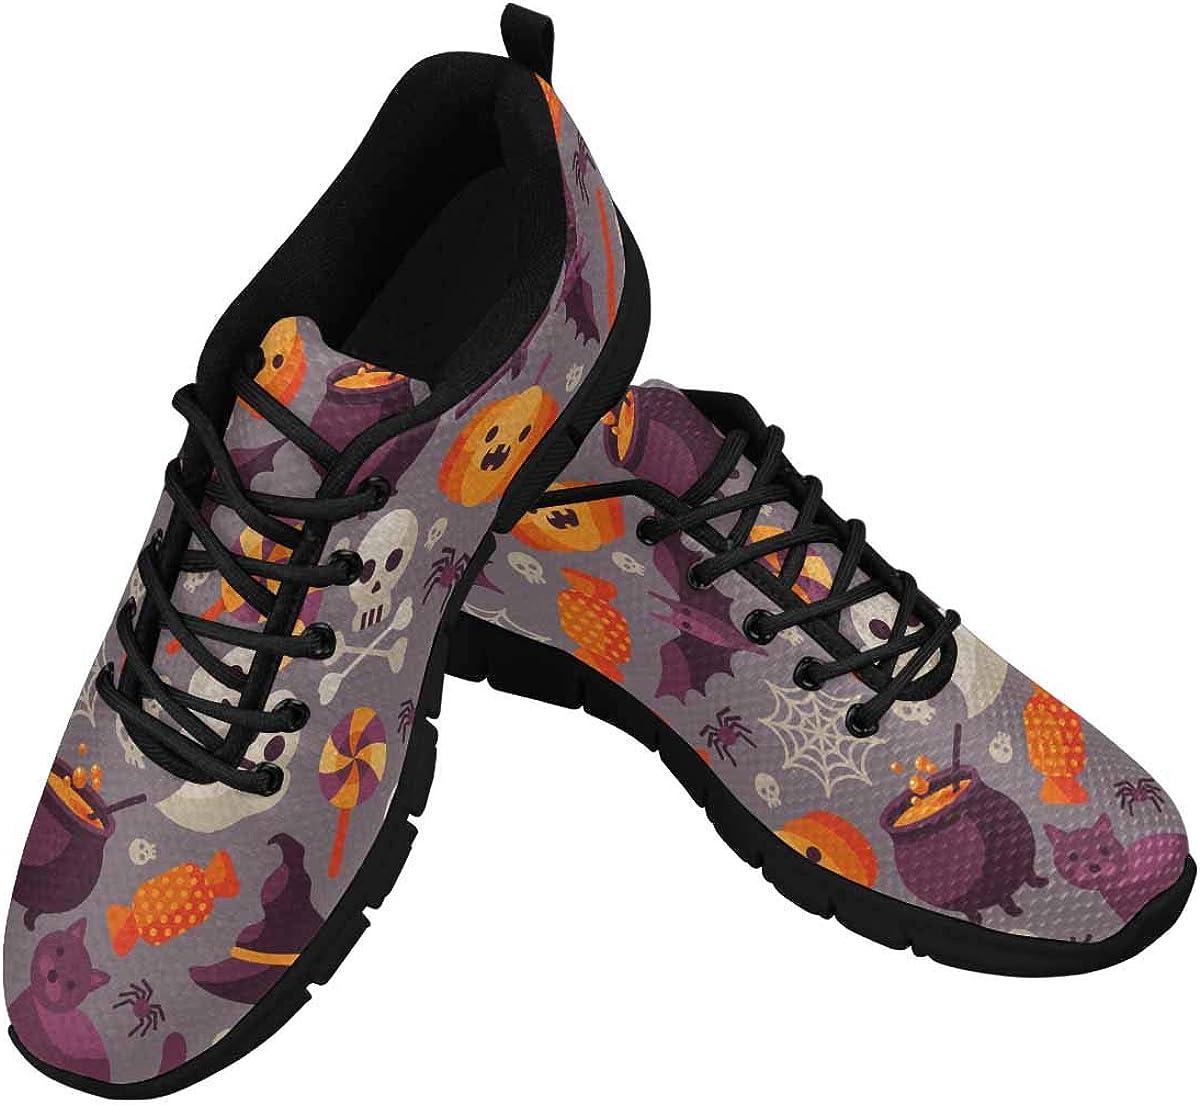 INTERESTPRINT Halloween Pattern with Orange Pumpkin Women's Lace Up Running Comfort Sports Sneakers